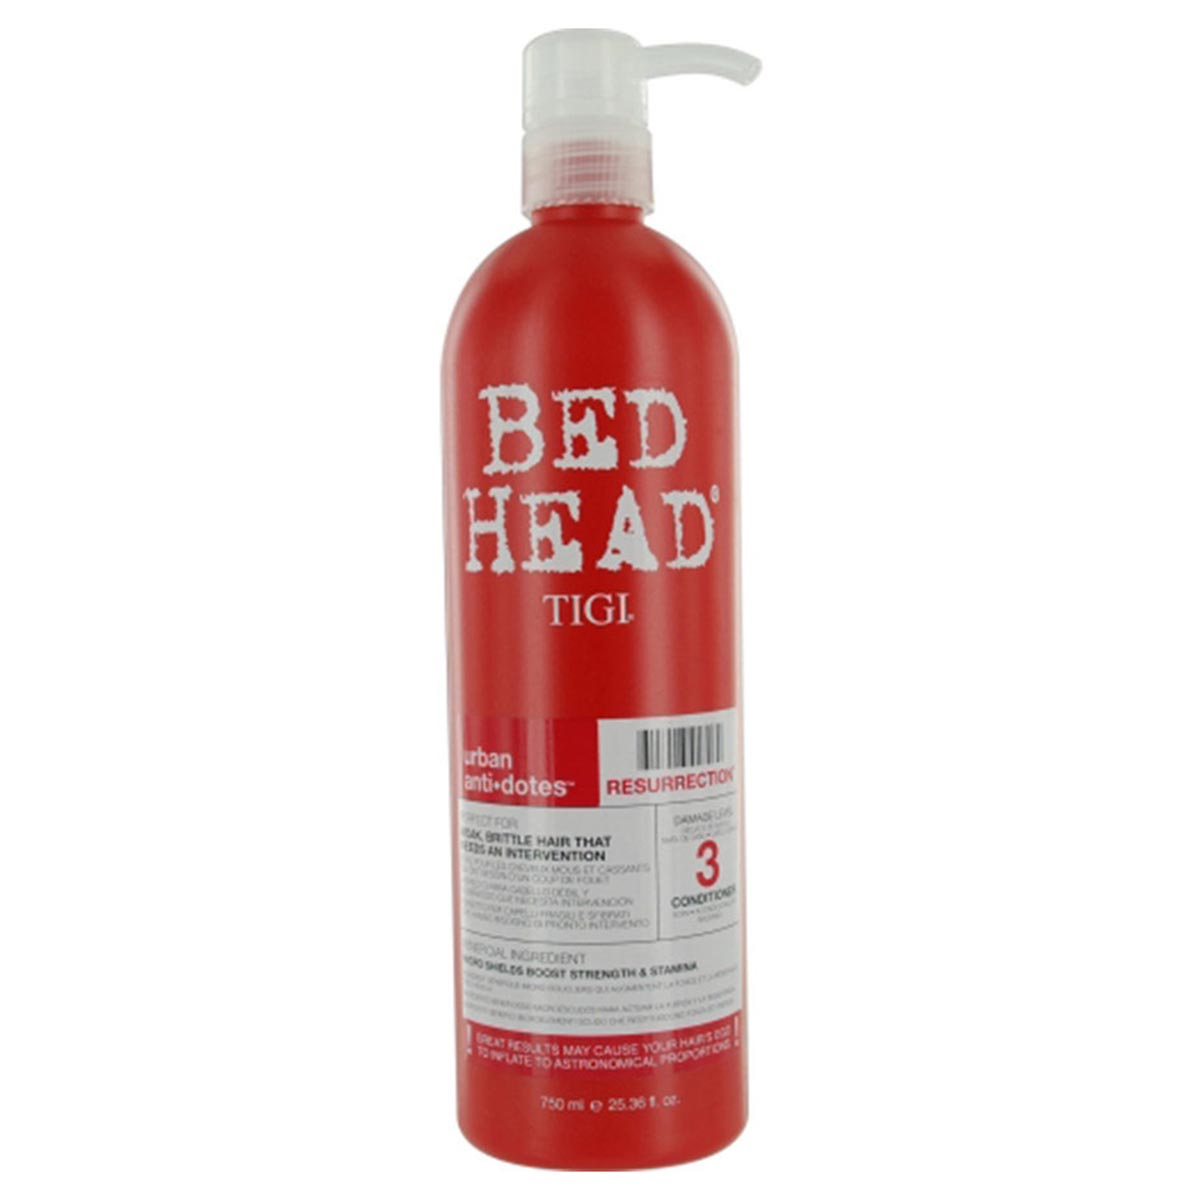 BED HEAD URBAN ANTI-DOTES RESURRECTION CONDITIONER 750ML